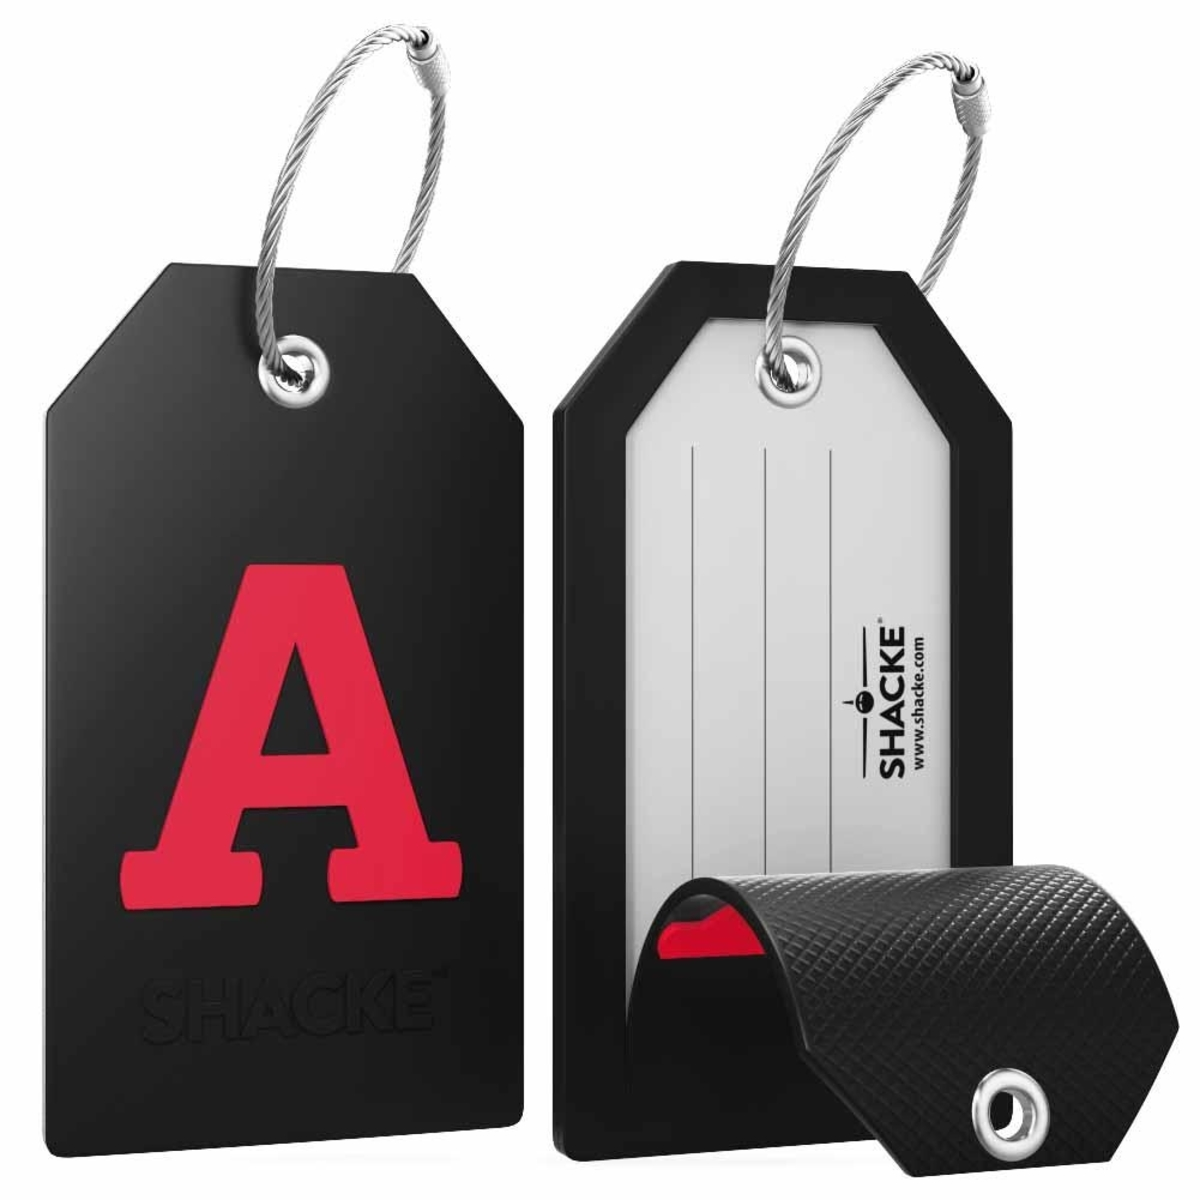 Shacke Initial Luggage Tag